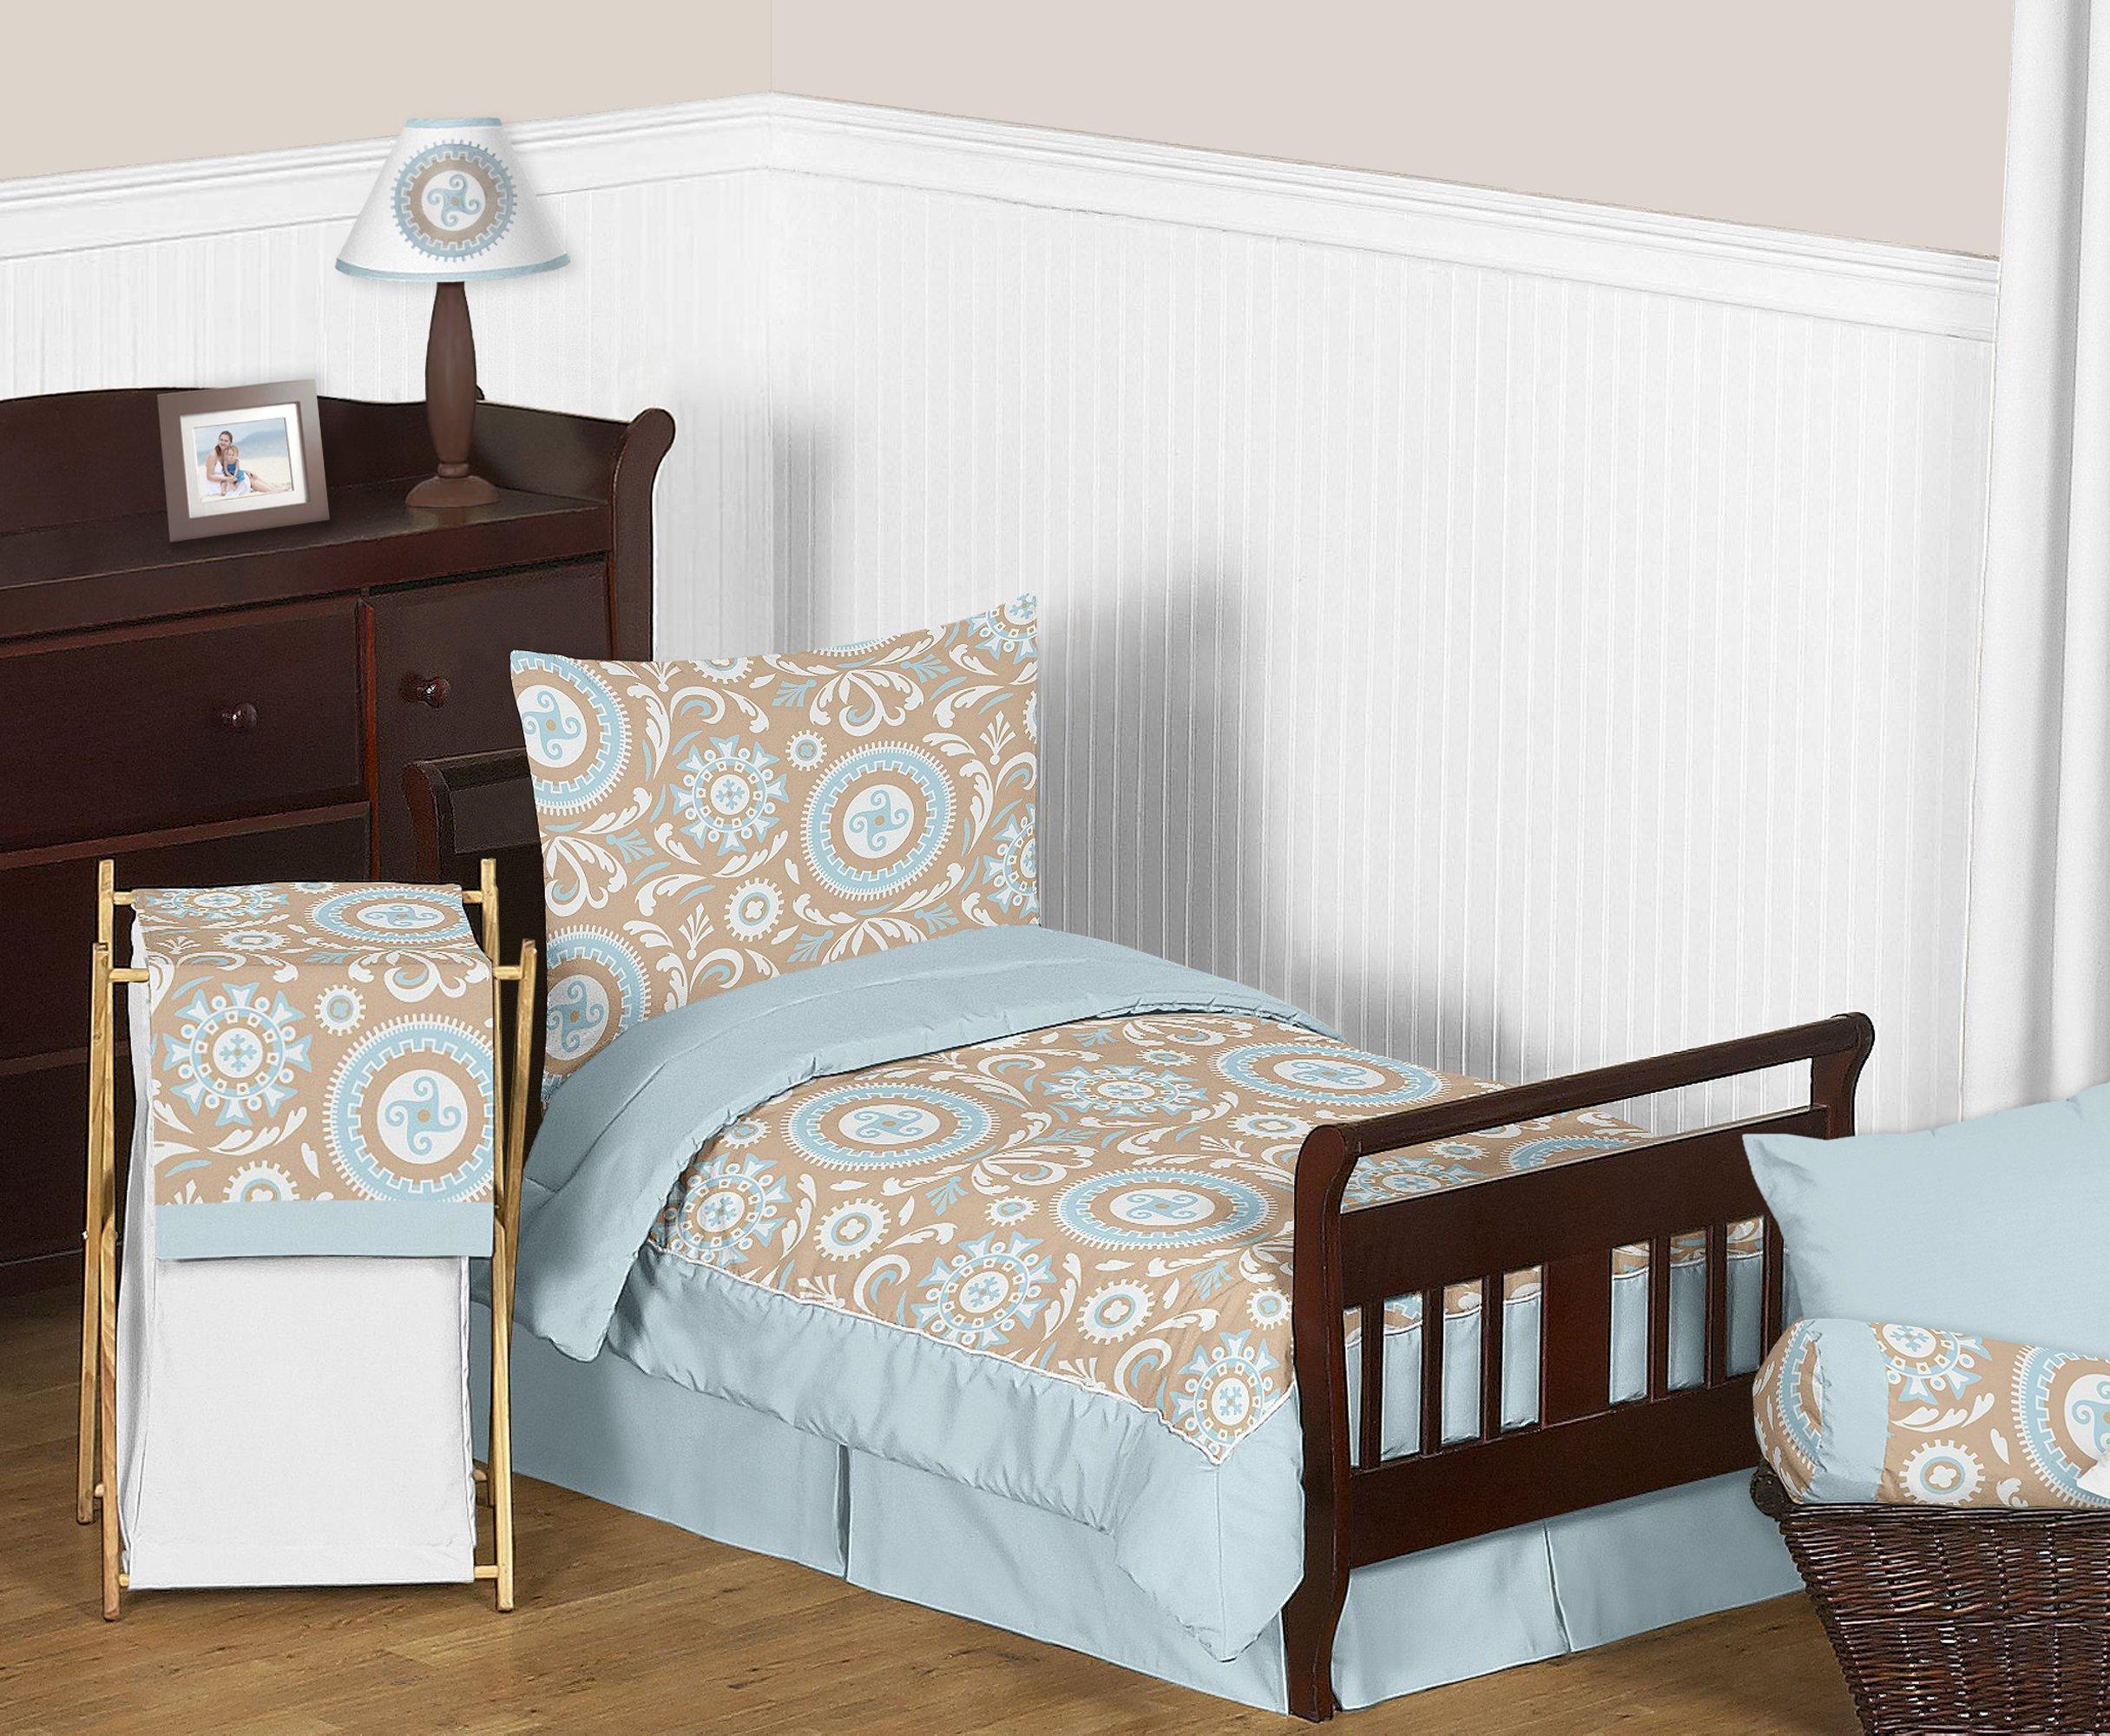 Sweet Jojo Designs Fitted Crib Sheet for Hayden Baby/Toddler Bedding - Blue